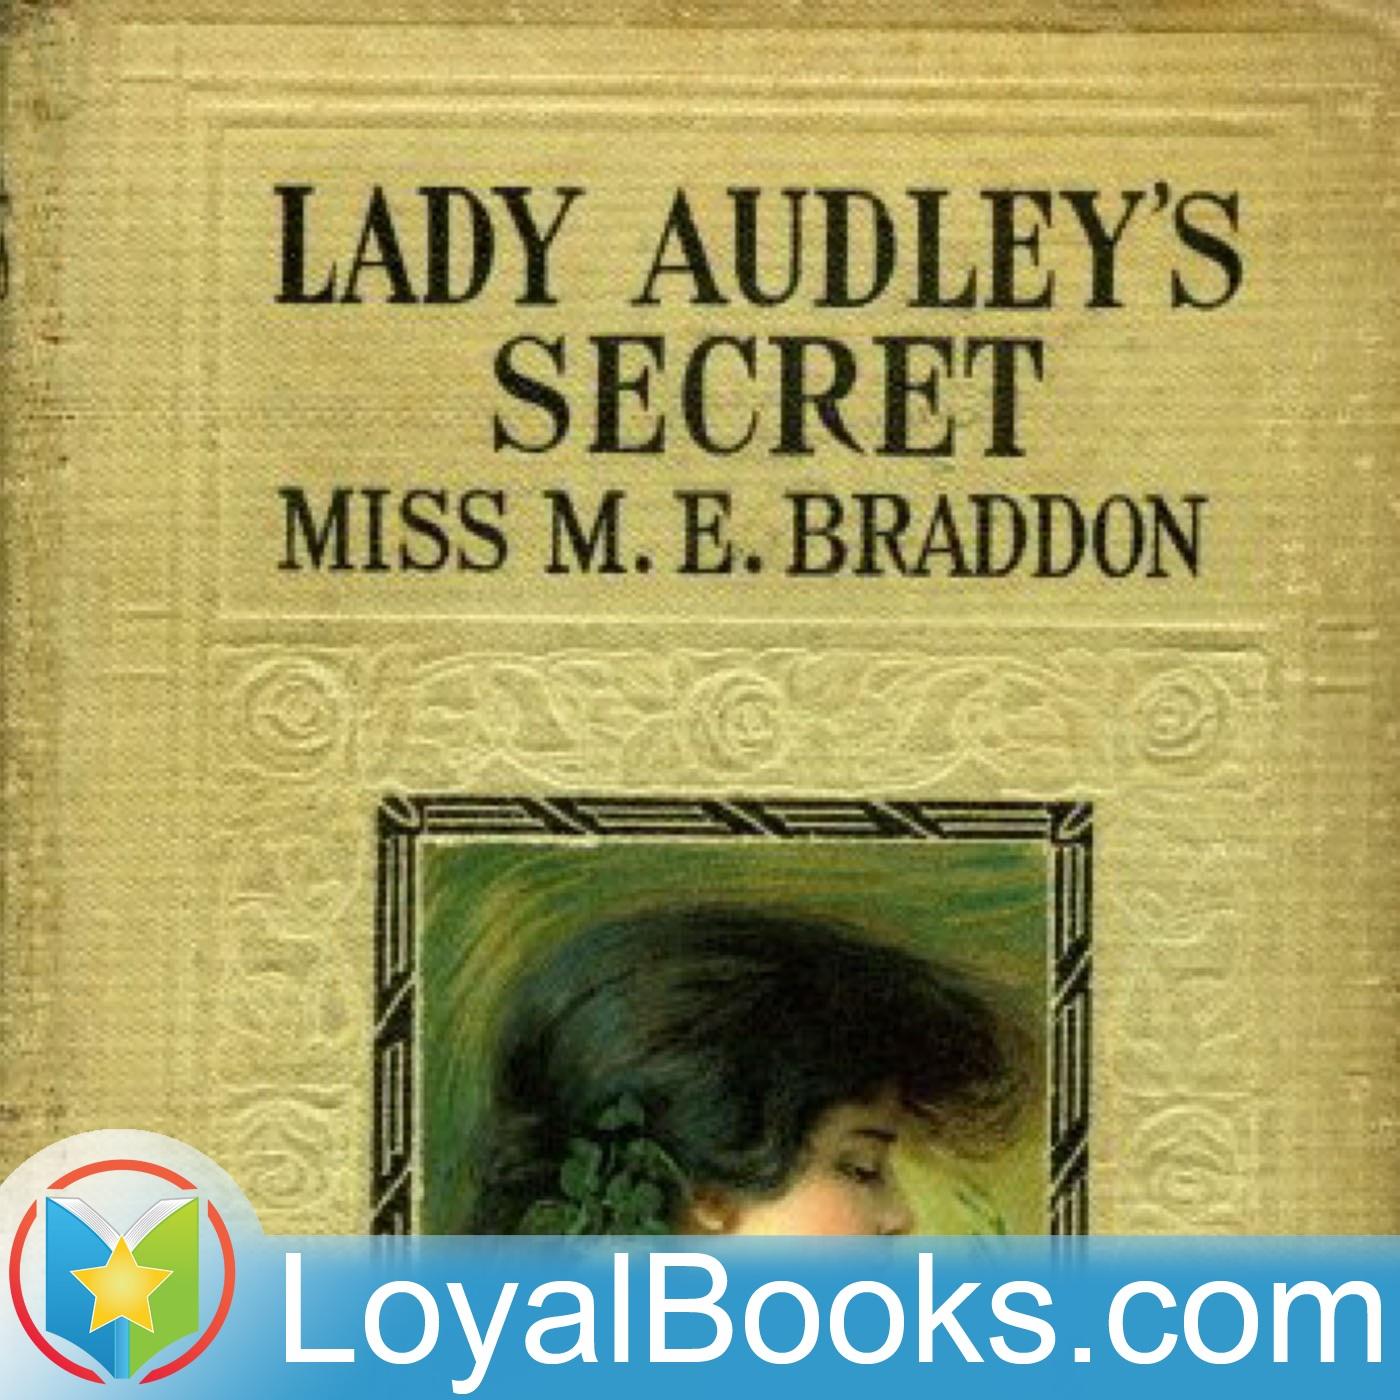 <![CDATA[Lady Audley's Secret by Mary Elizabeth Braddon]]>